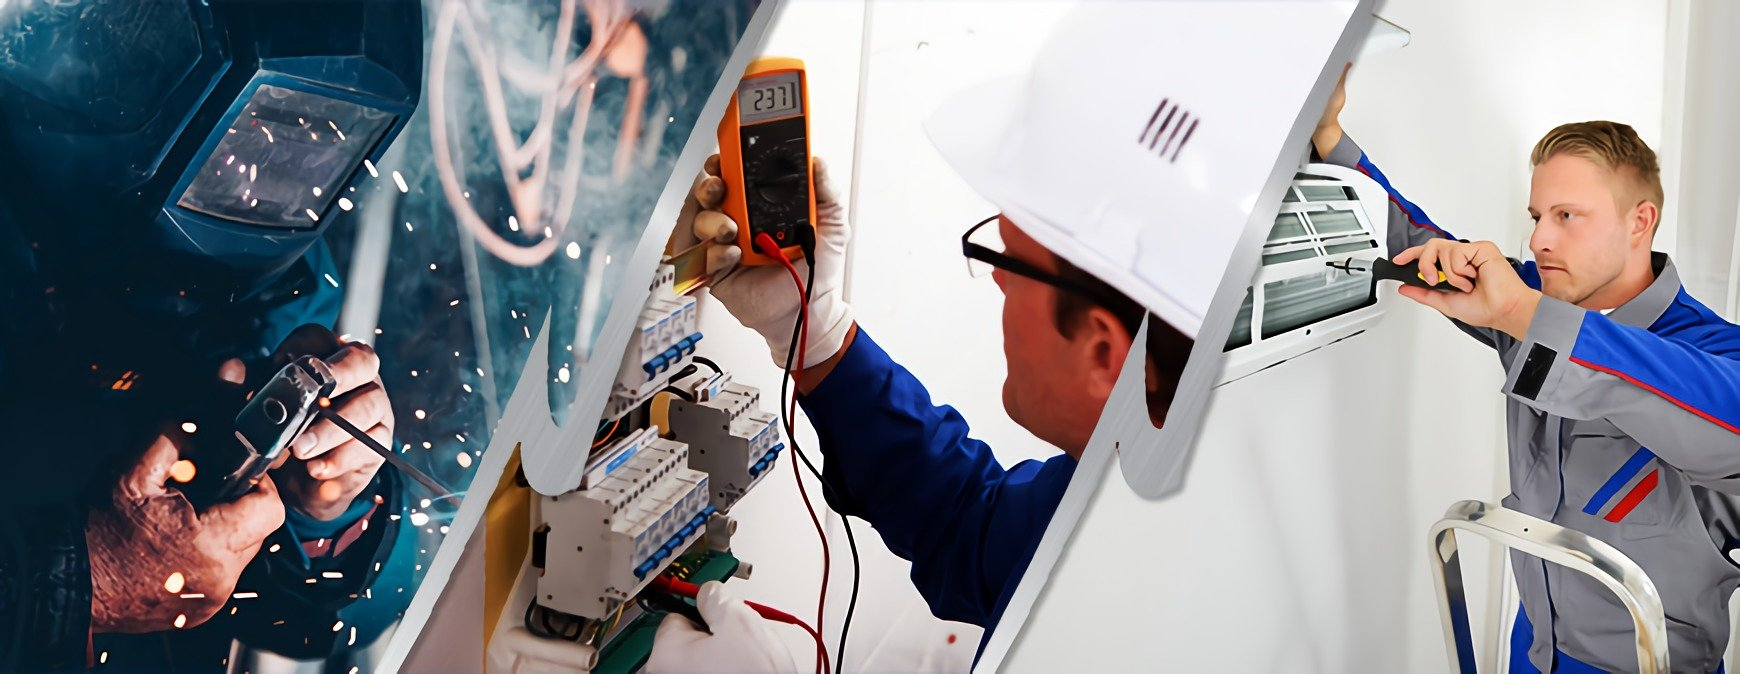 welder electrician and hvac technician